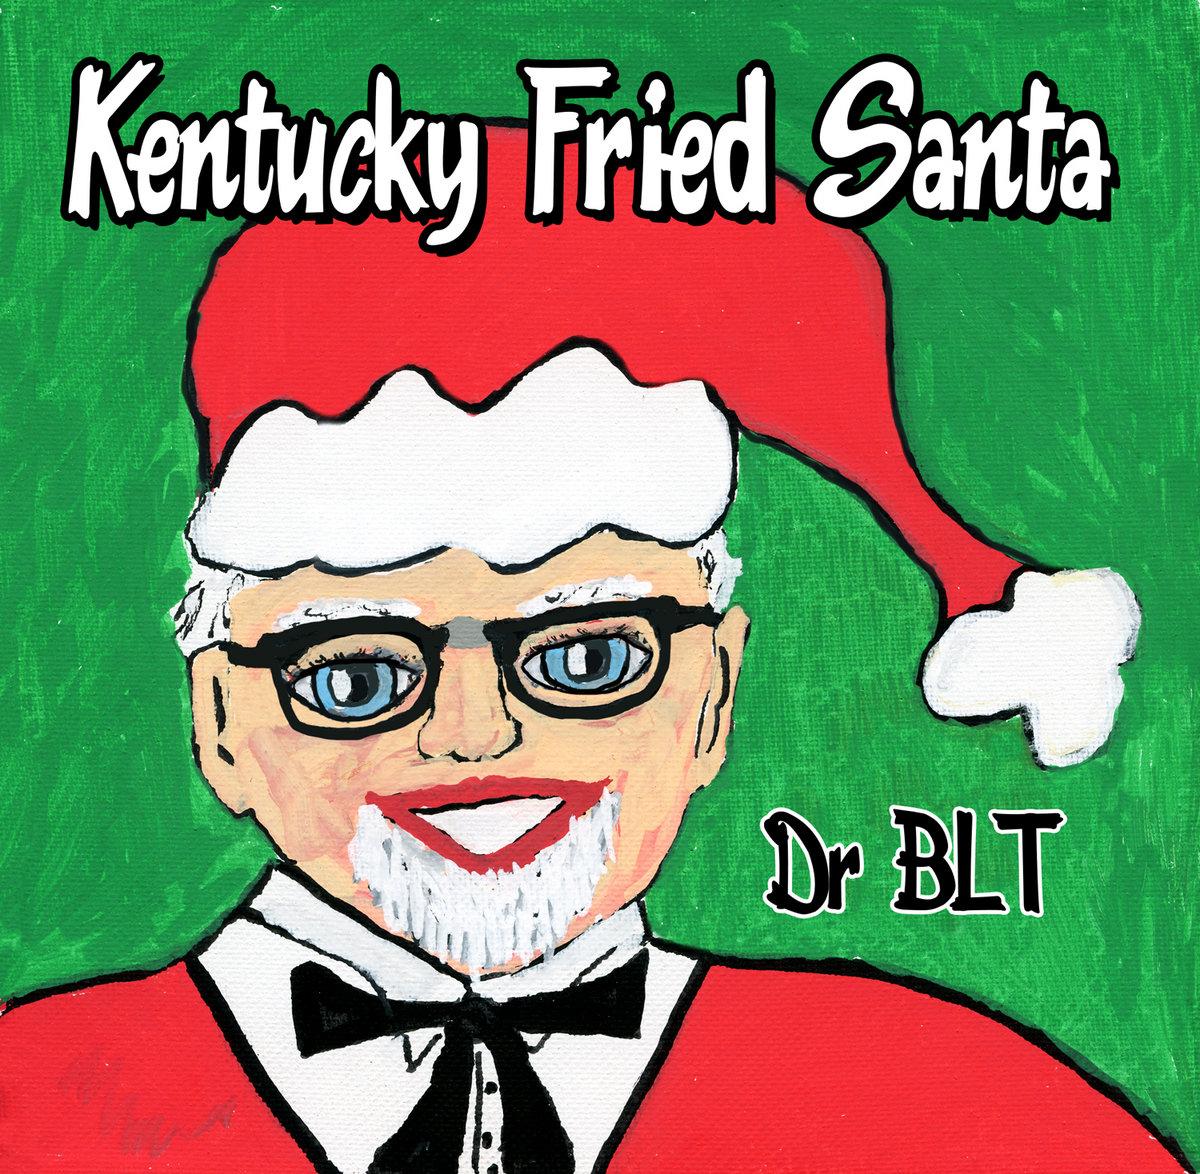 Ballad of Kentucky Fried Santa Part I by Dr BLT